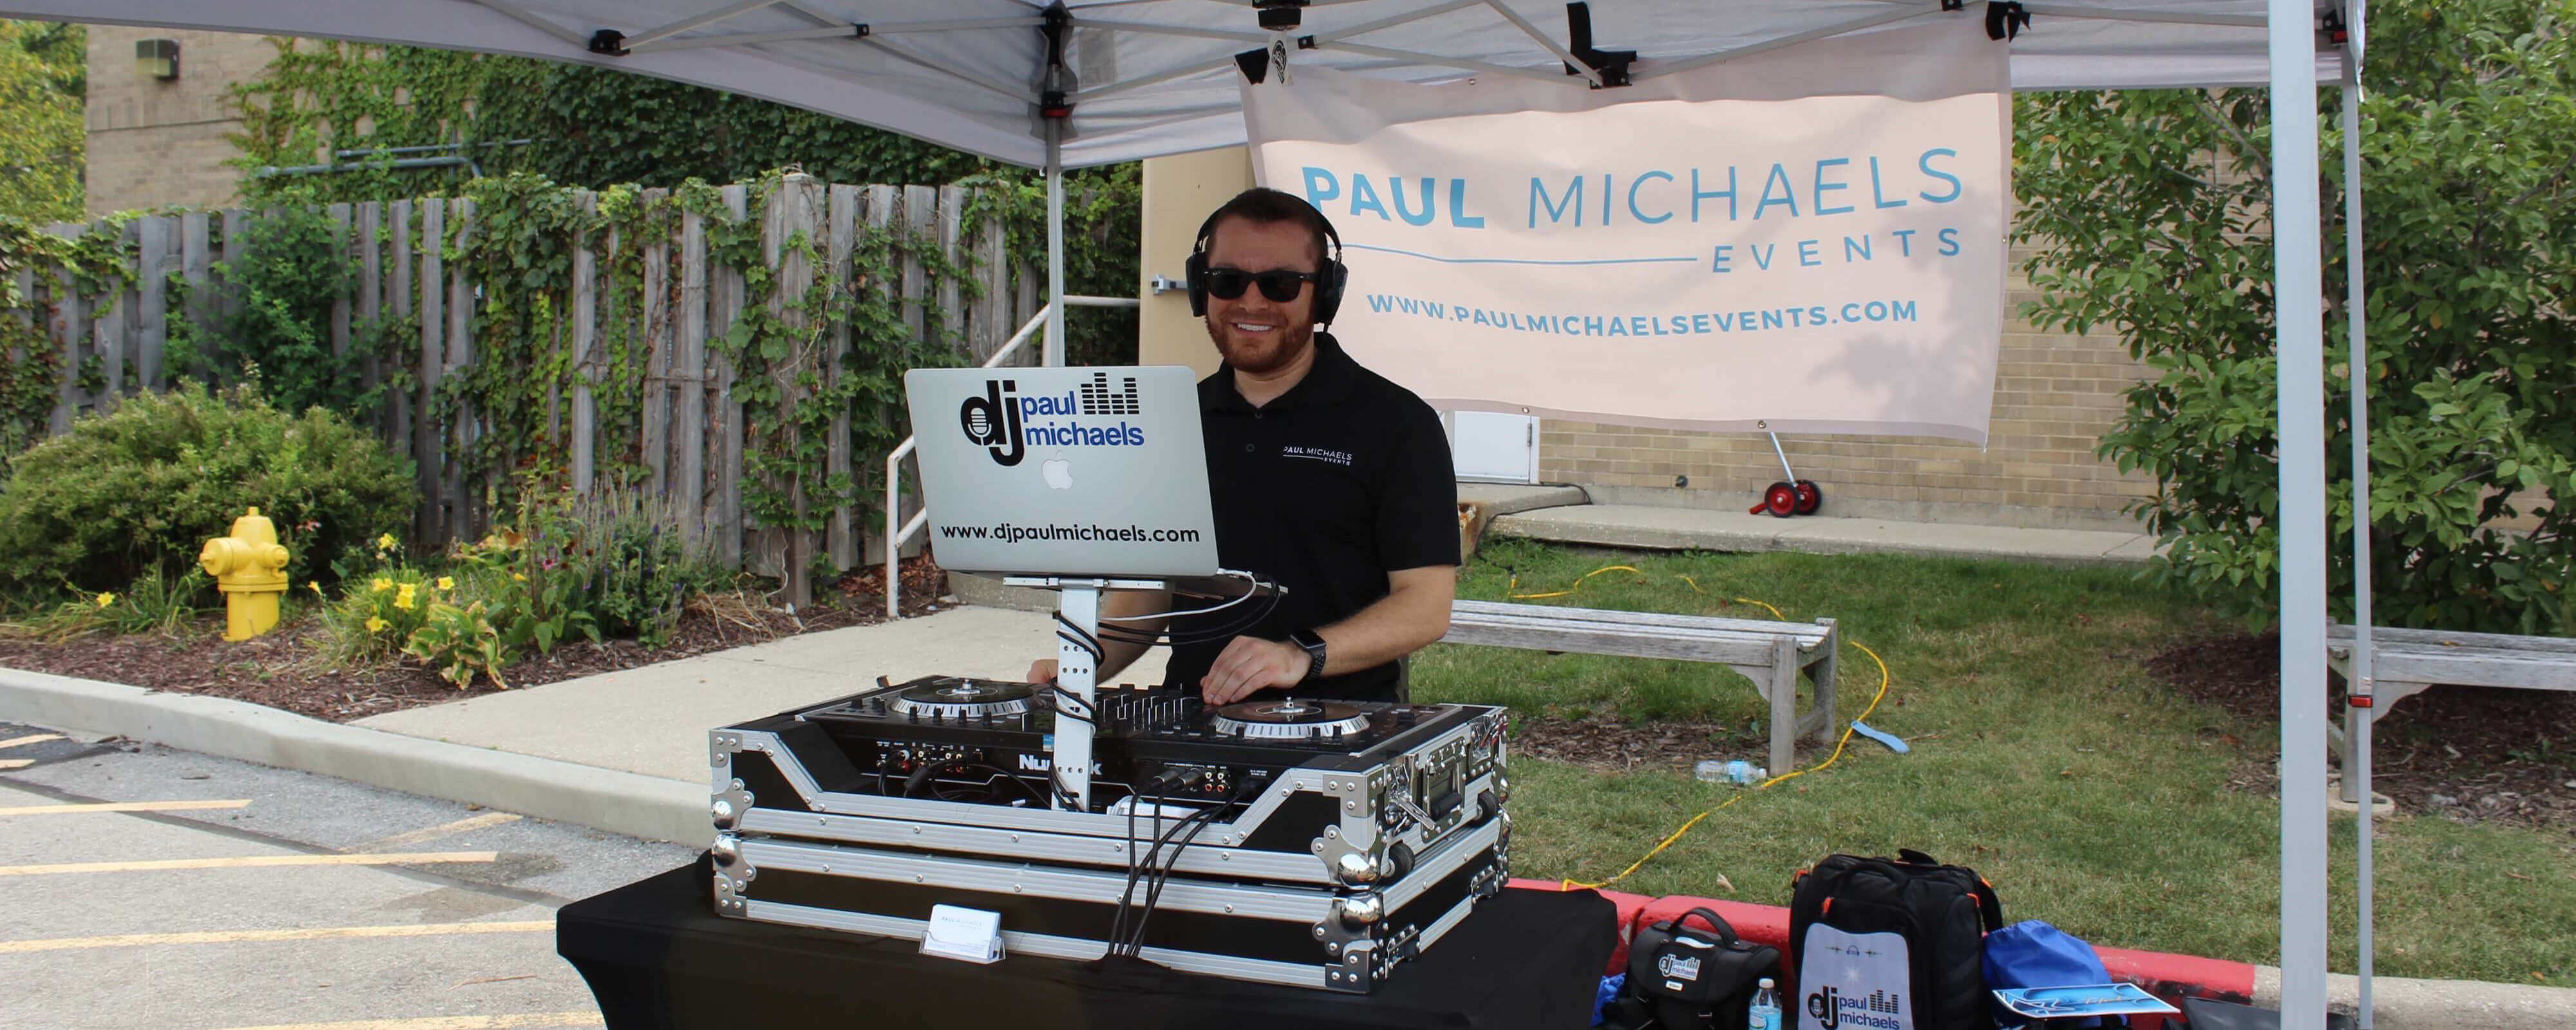 DJ Paul Michaels at the Etz Chaim High Holiday Hustle 5K Philanthropic Event